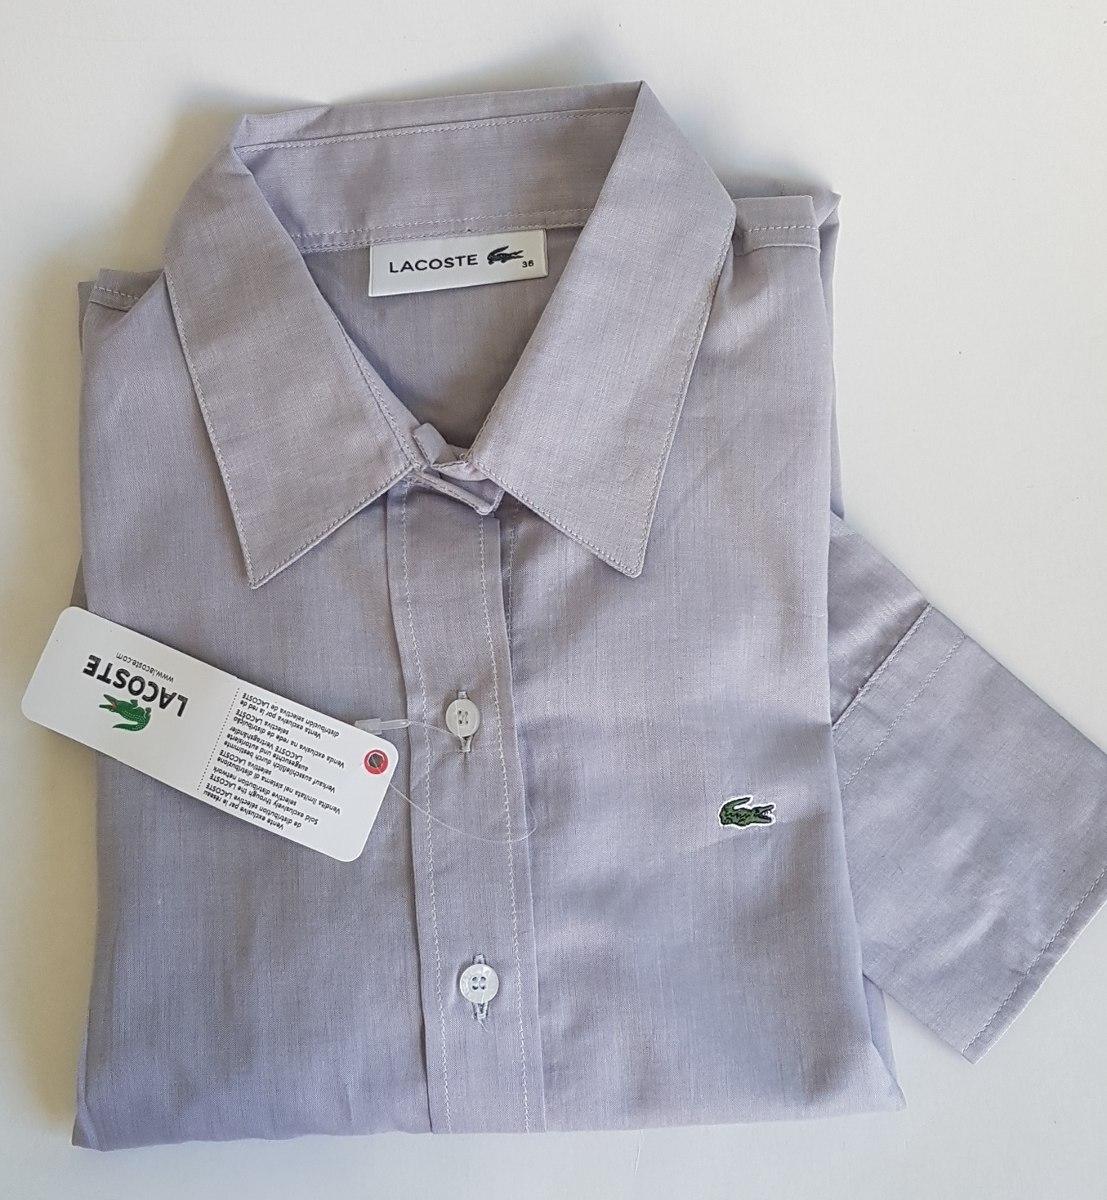 df1d7a2788716 camisa social feminina lacoste original cinza t36. Carregando zoom.